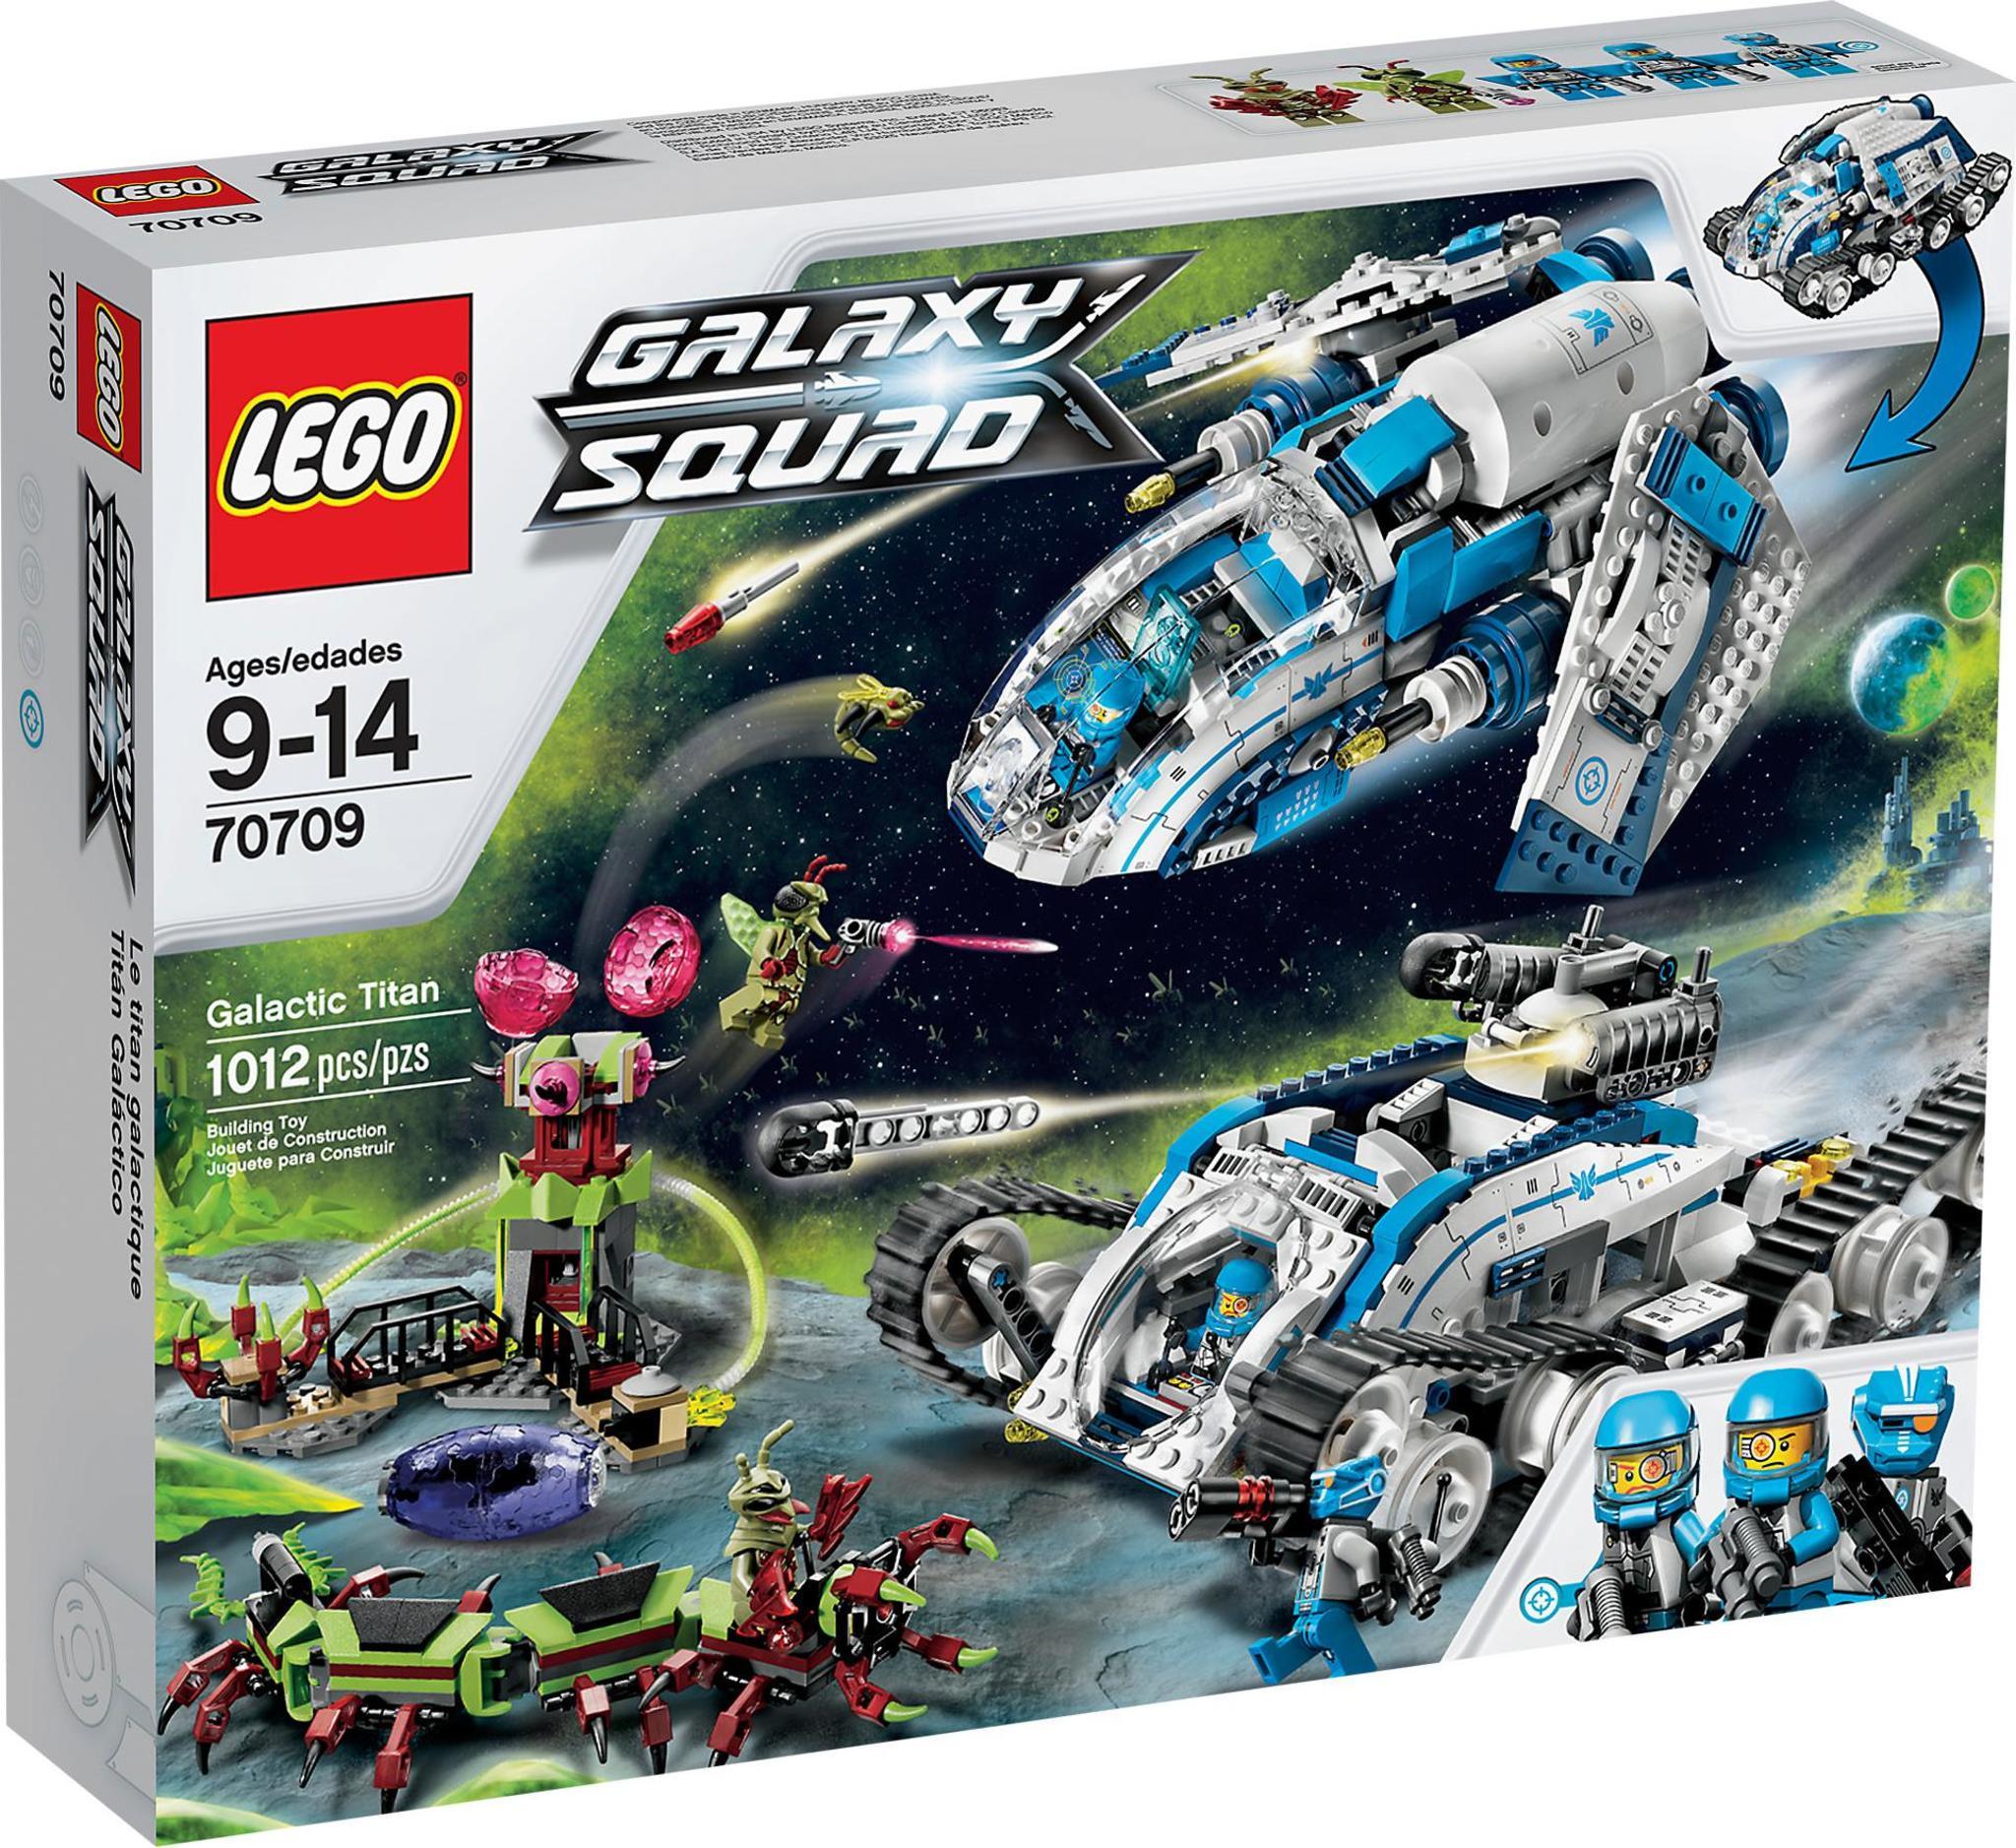 Lego Galactic Lego Titan Galactic Space 70709 Titan Space 70709 Lego 0v8nNwm